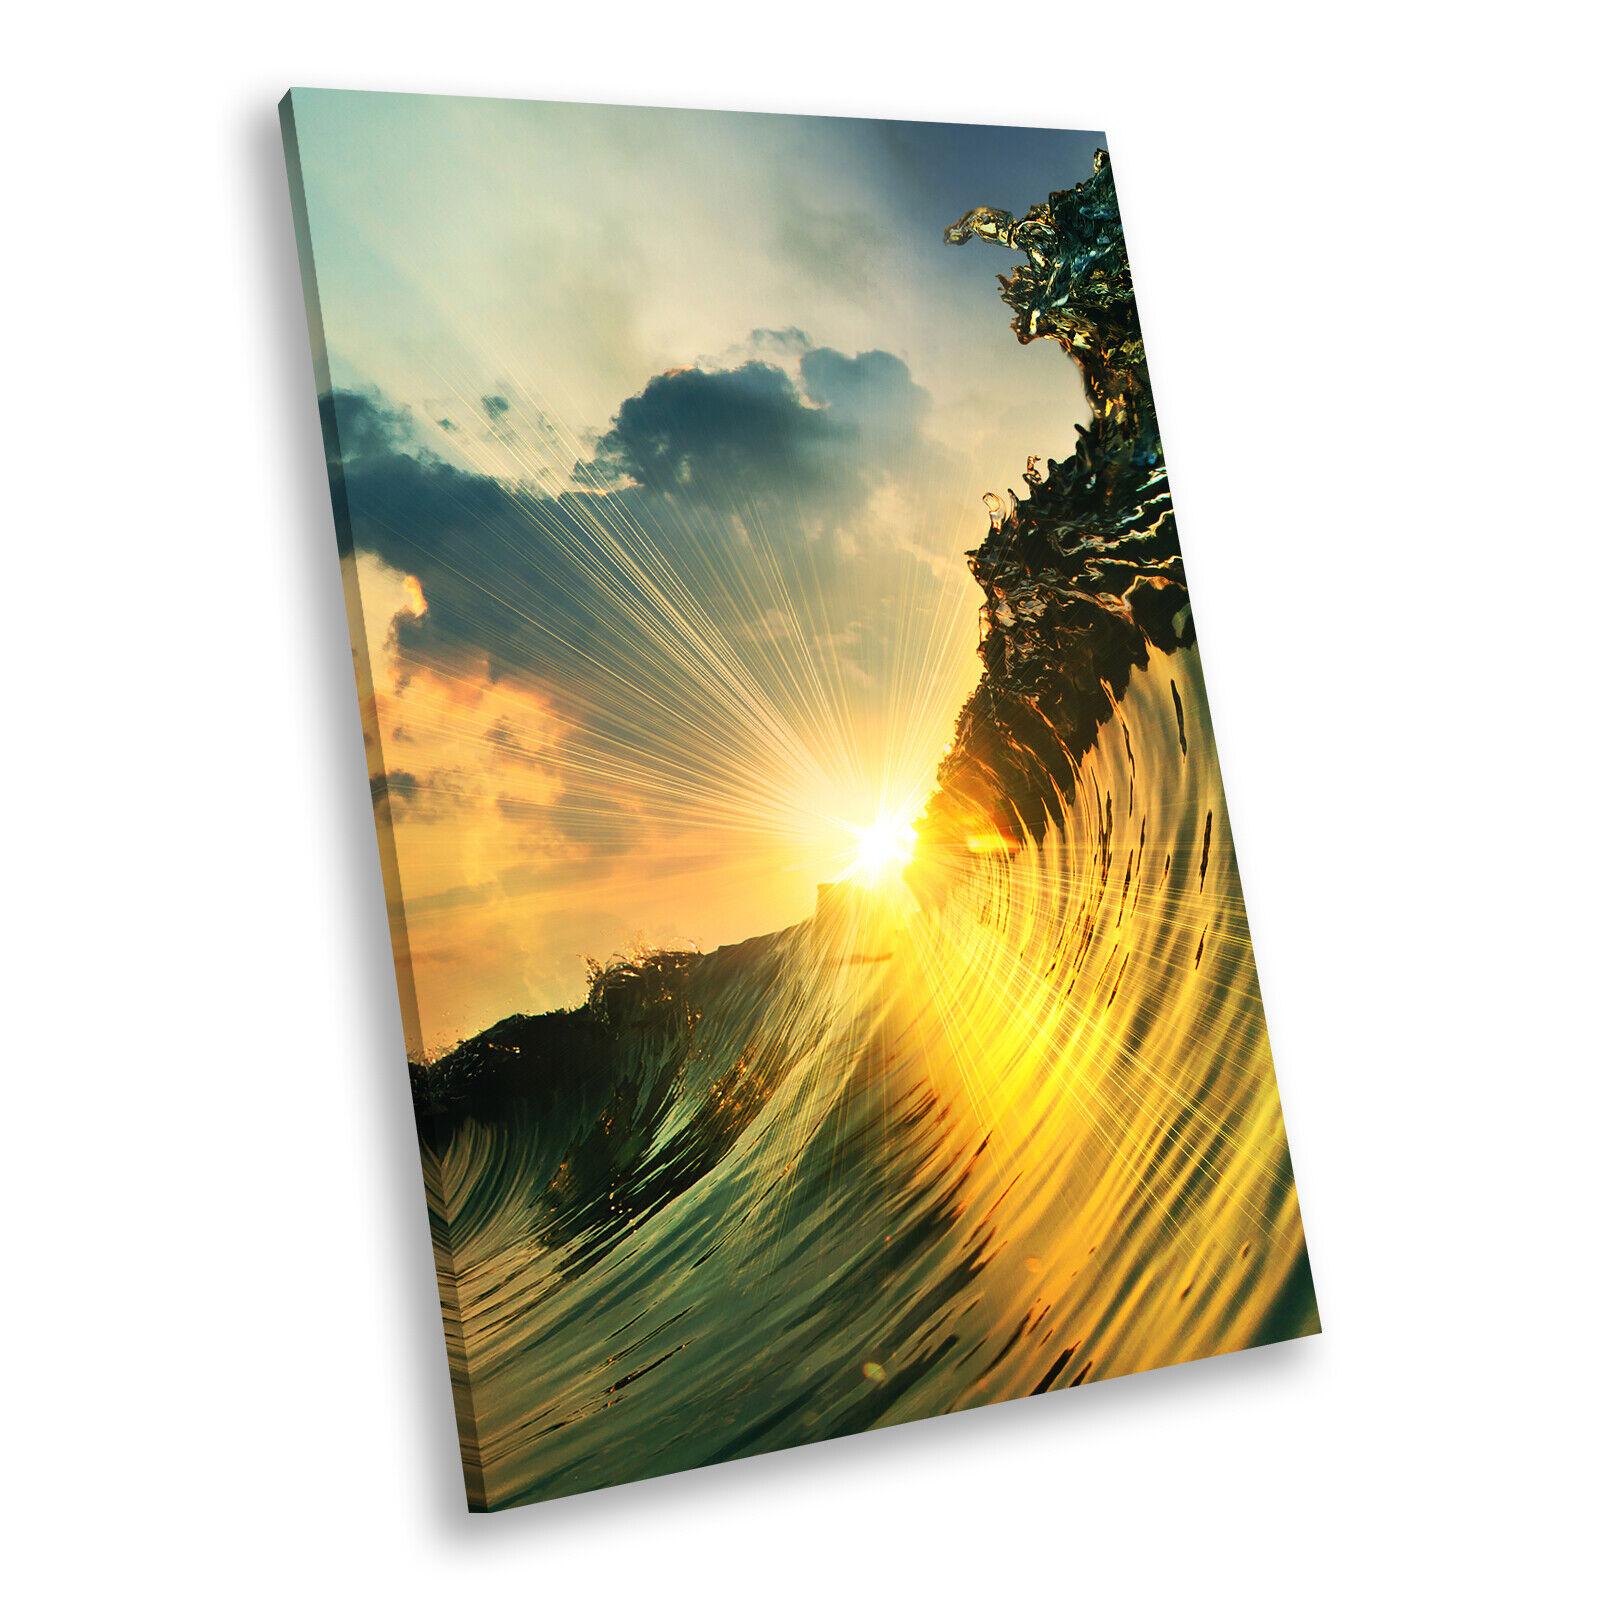 Grün Gelb Wave Sunset Cool Portrait Scenic Canvas Wall Art Picture Prints